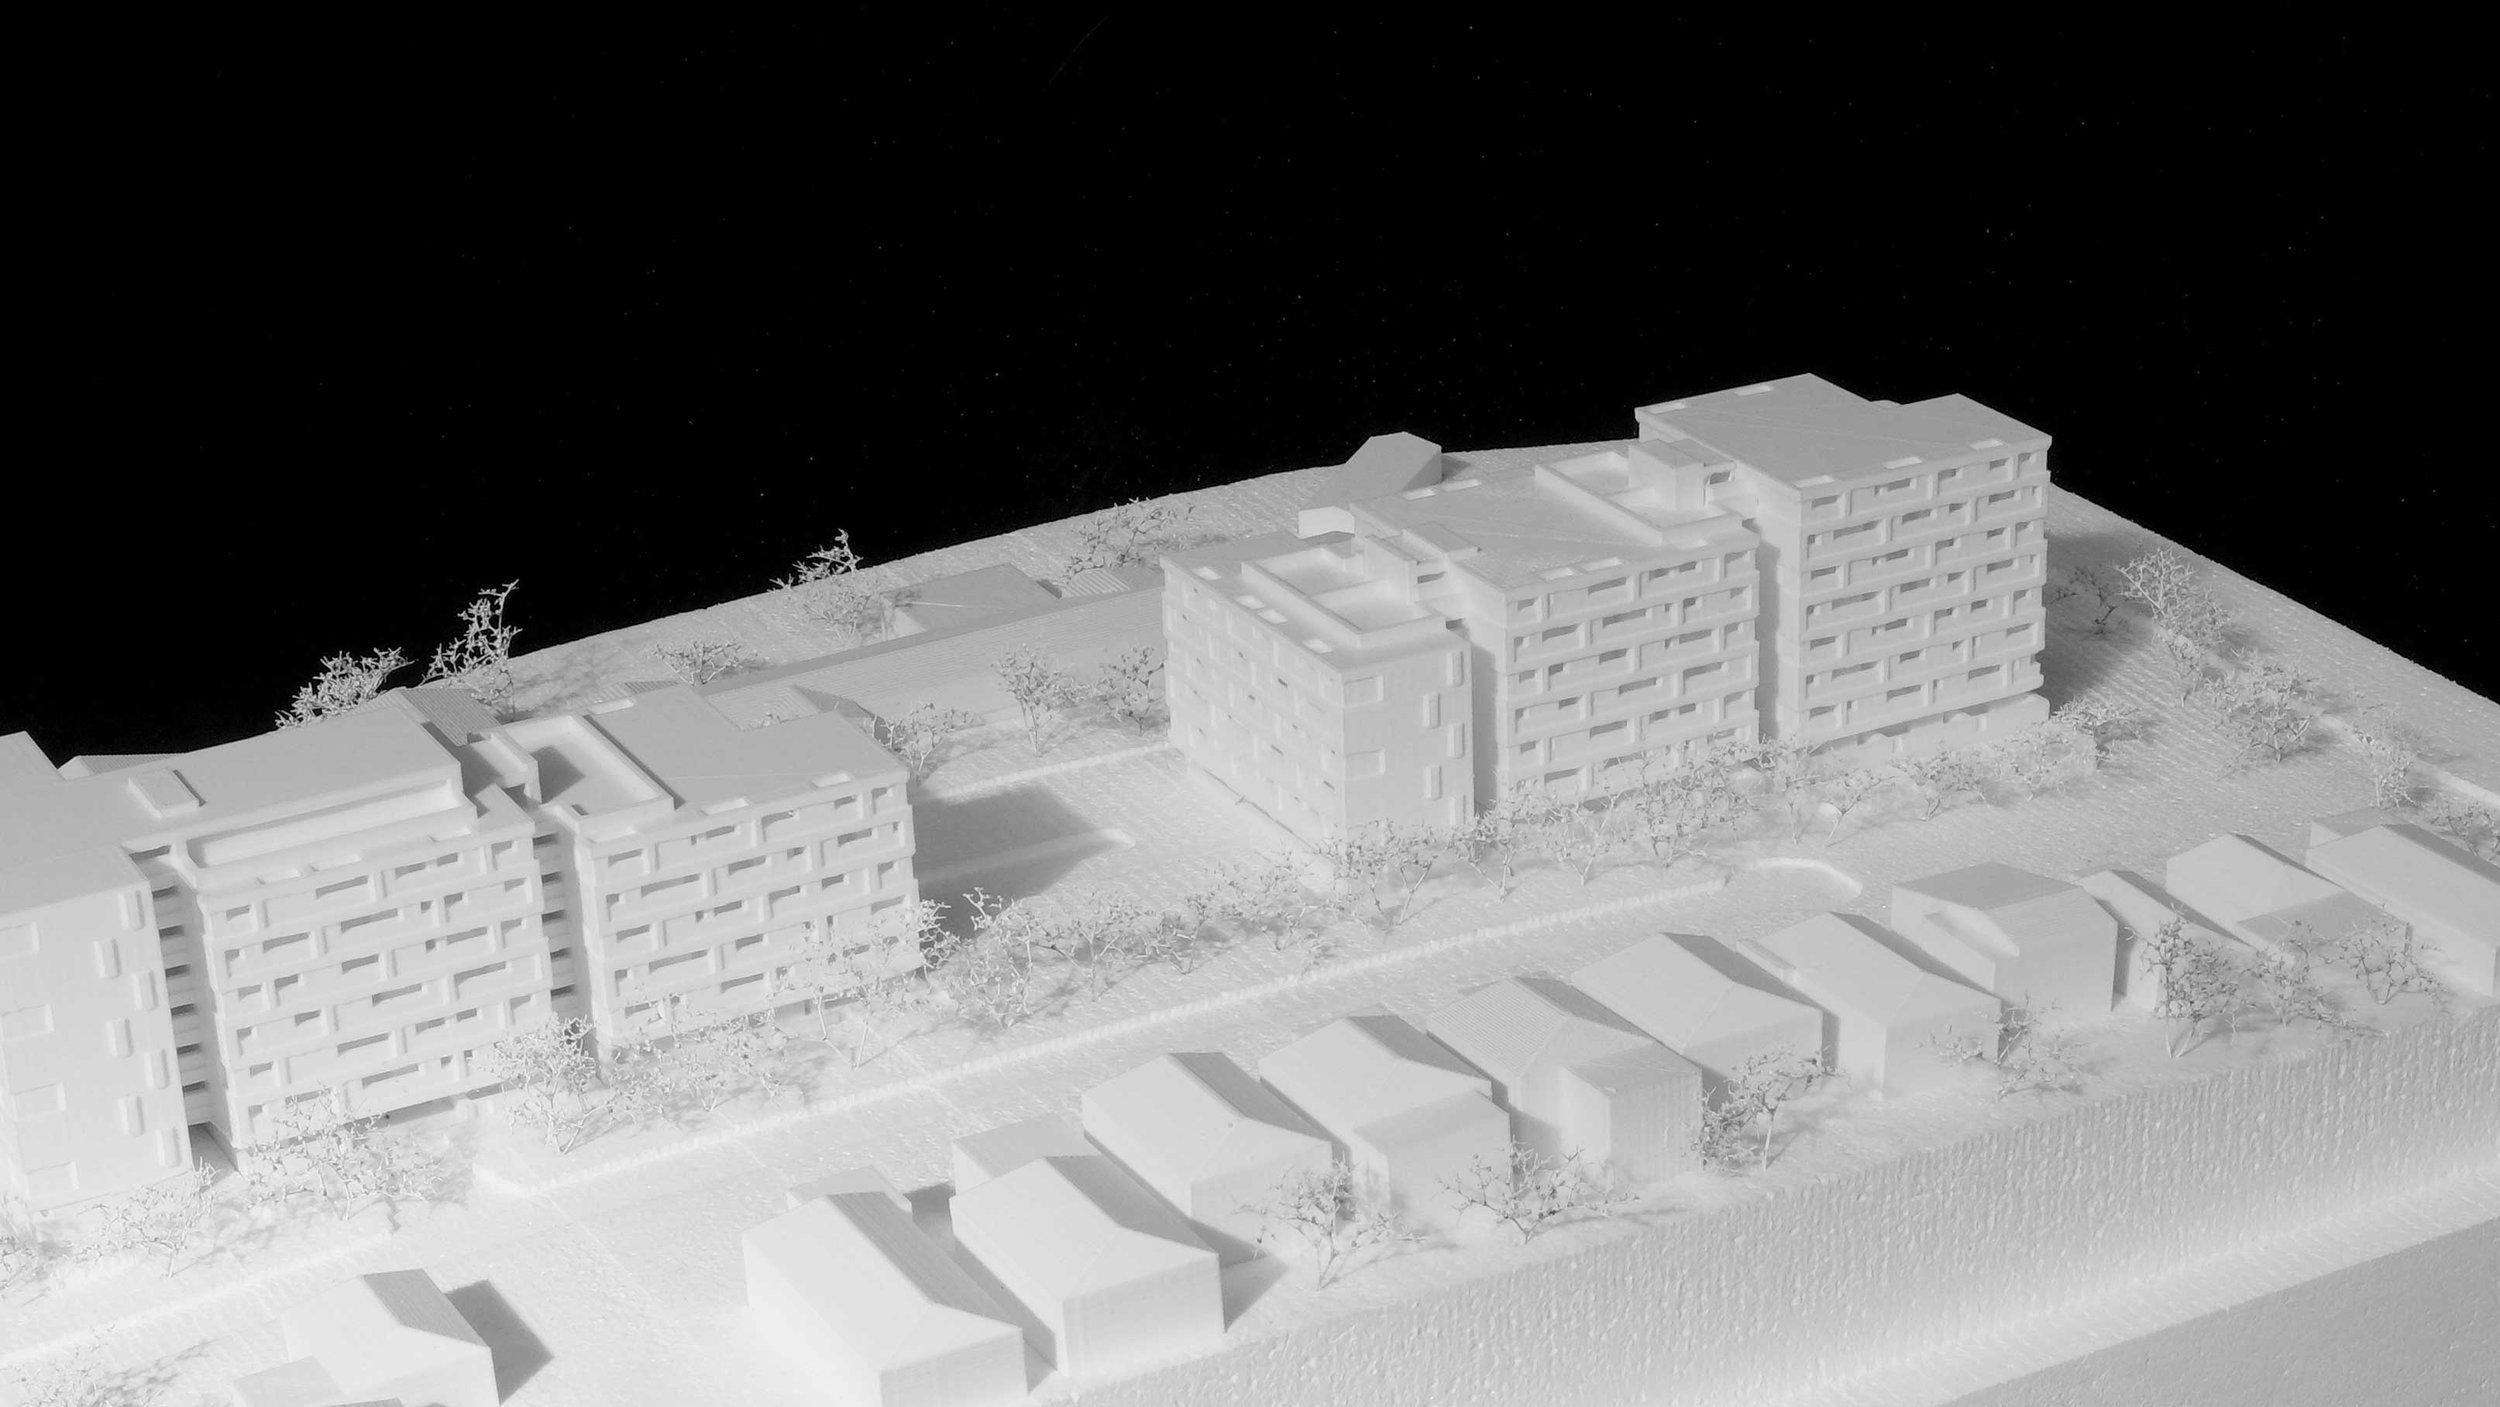 CNC_foam_make_models_laser_cutting_architecture_models_3D_print.jpg